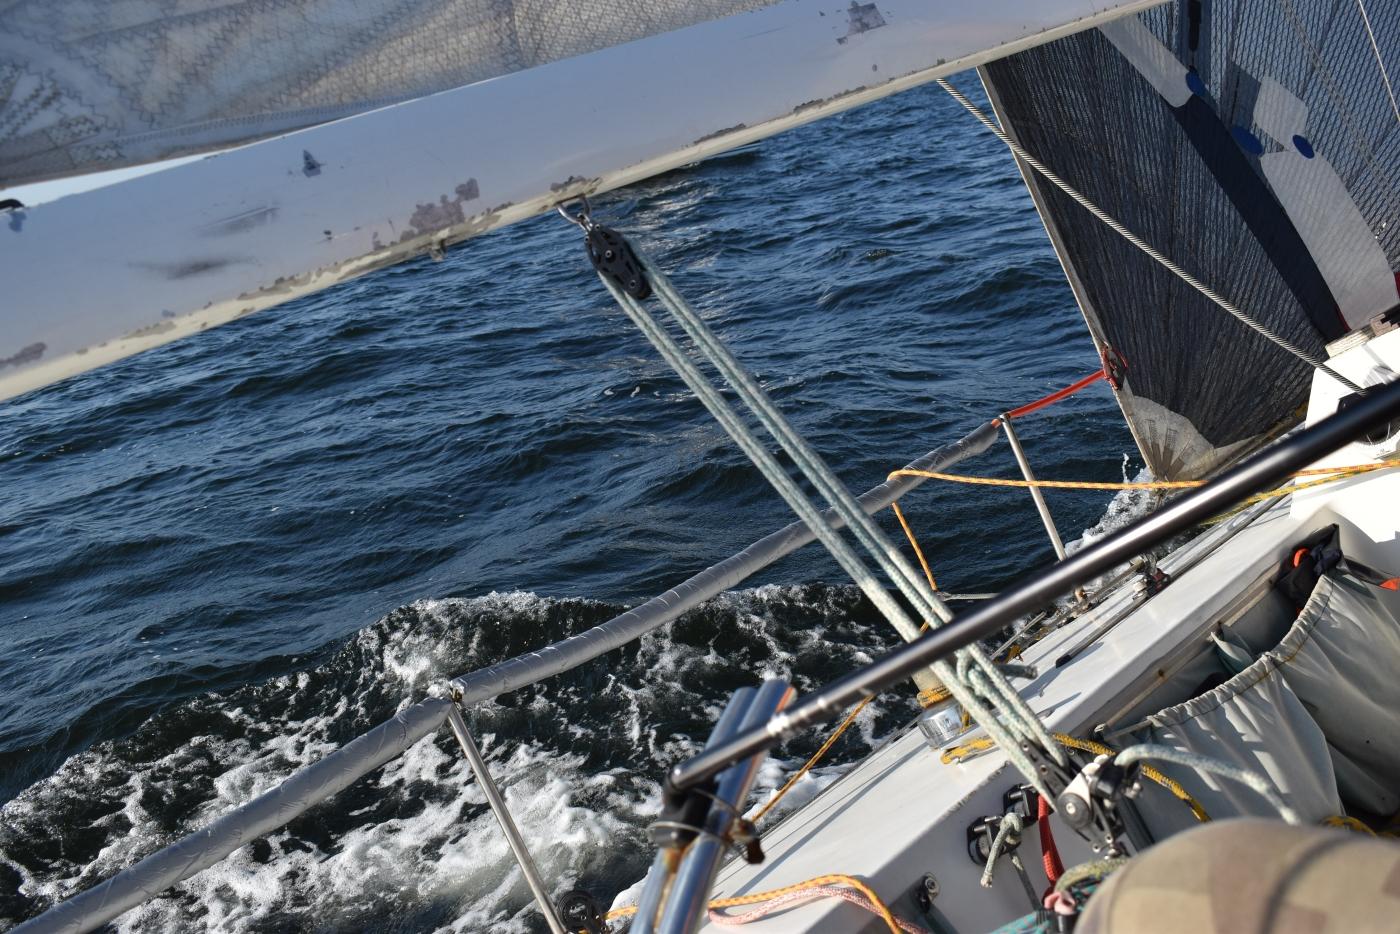 спорт, спорт25, парус, яхта, парусный спорт